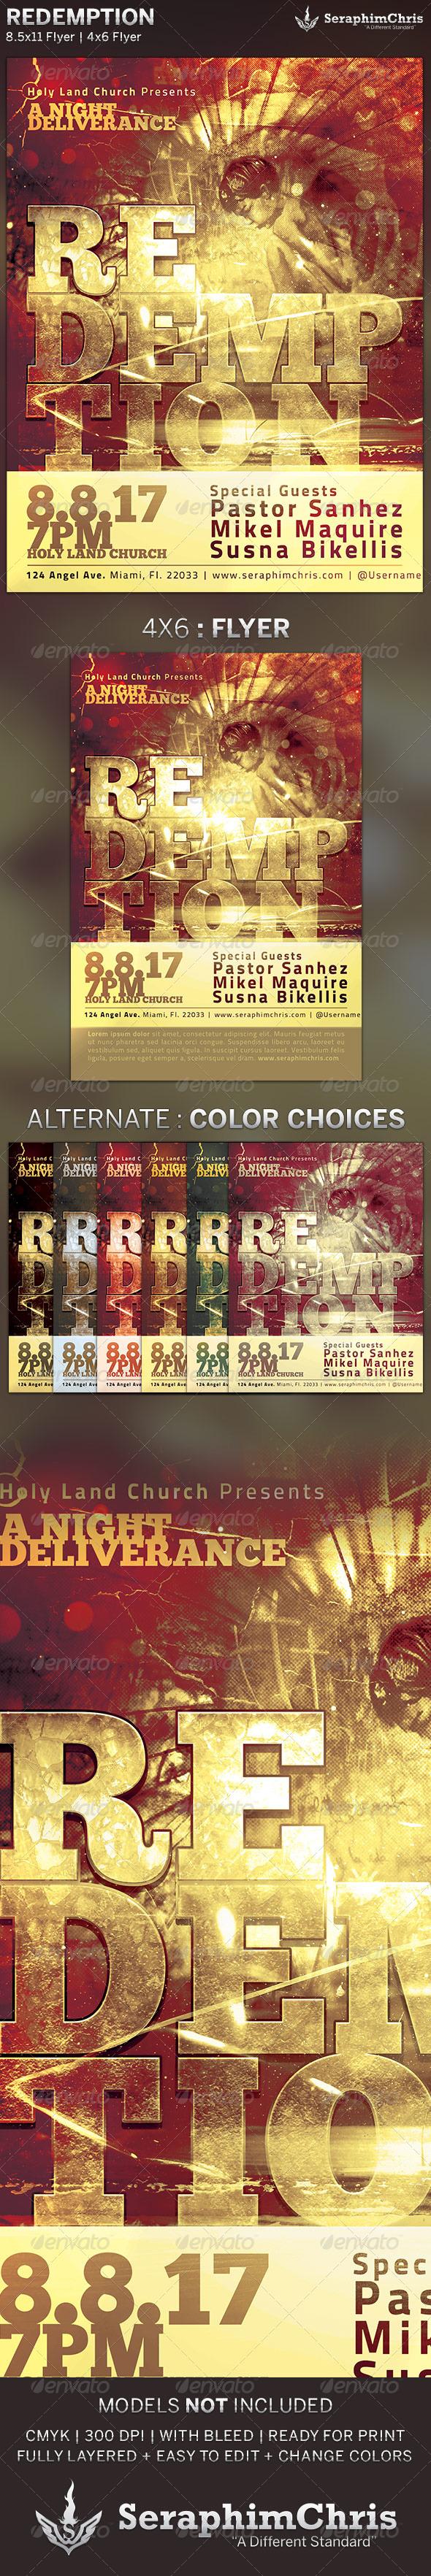 Redemption Church Flyer Template - Church Flyers